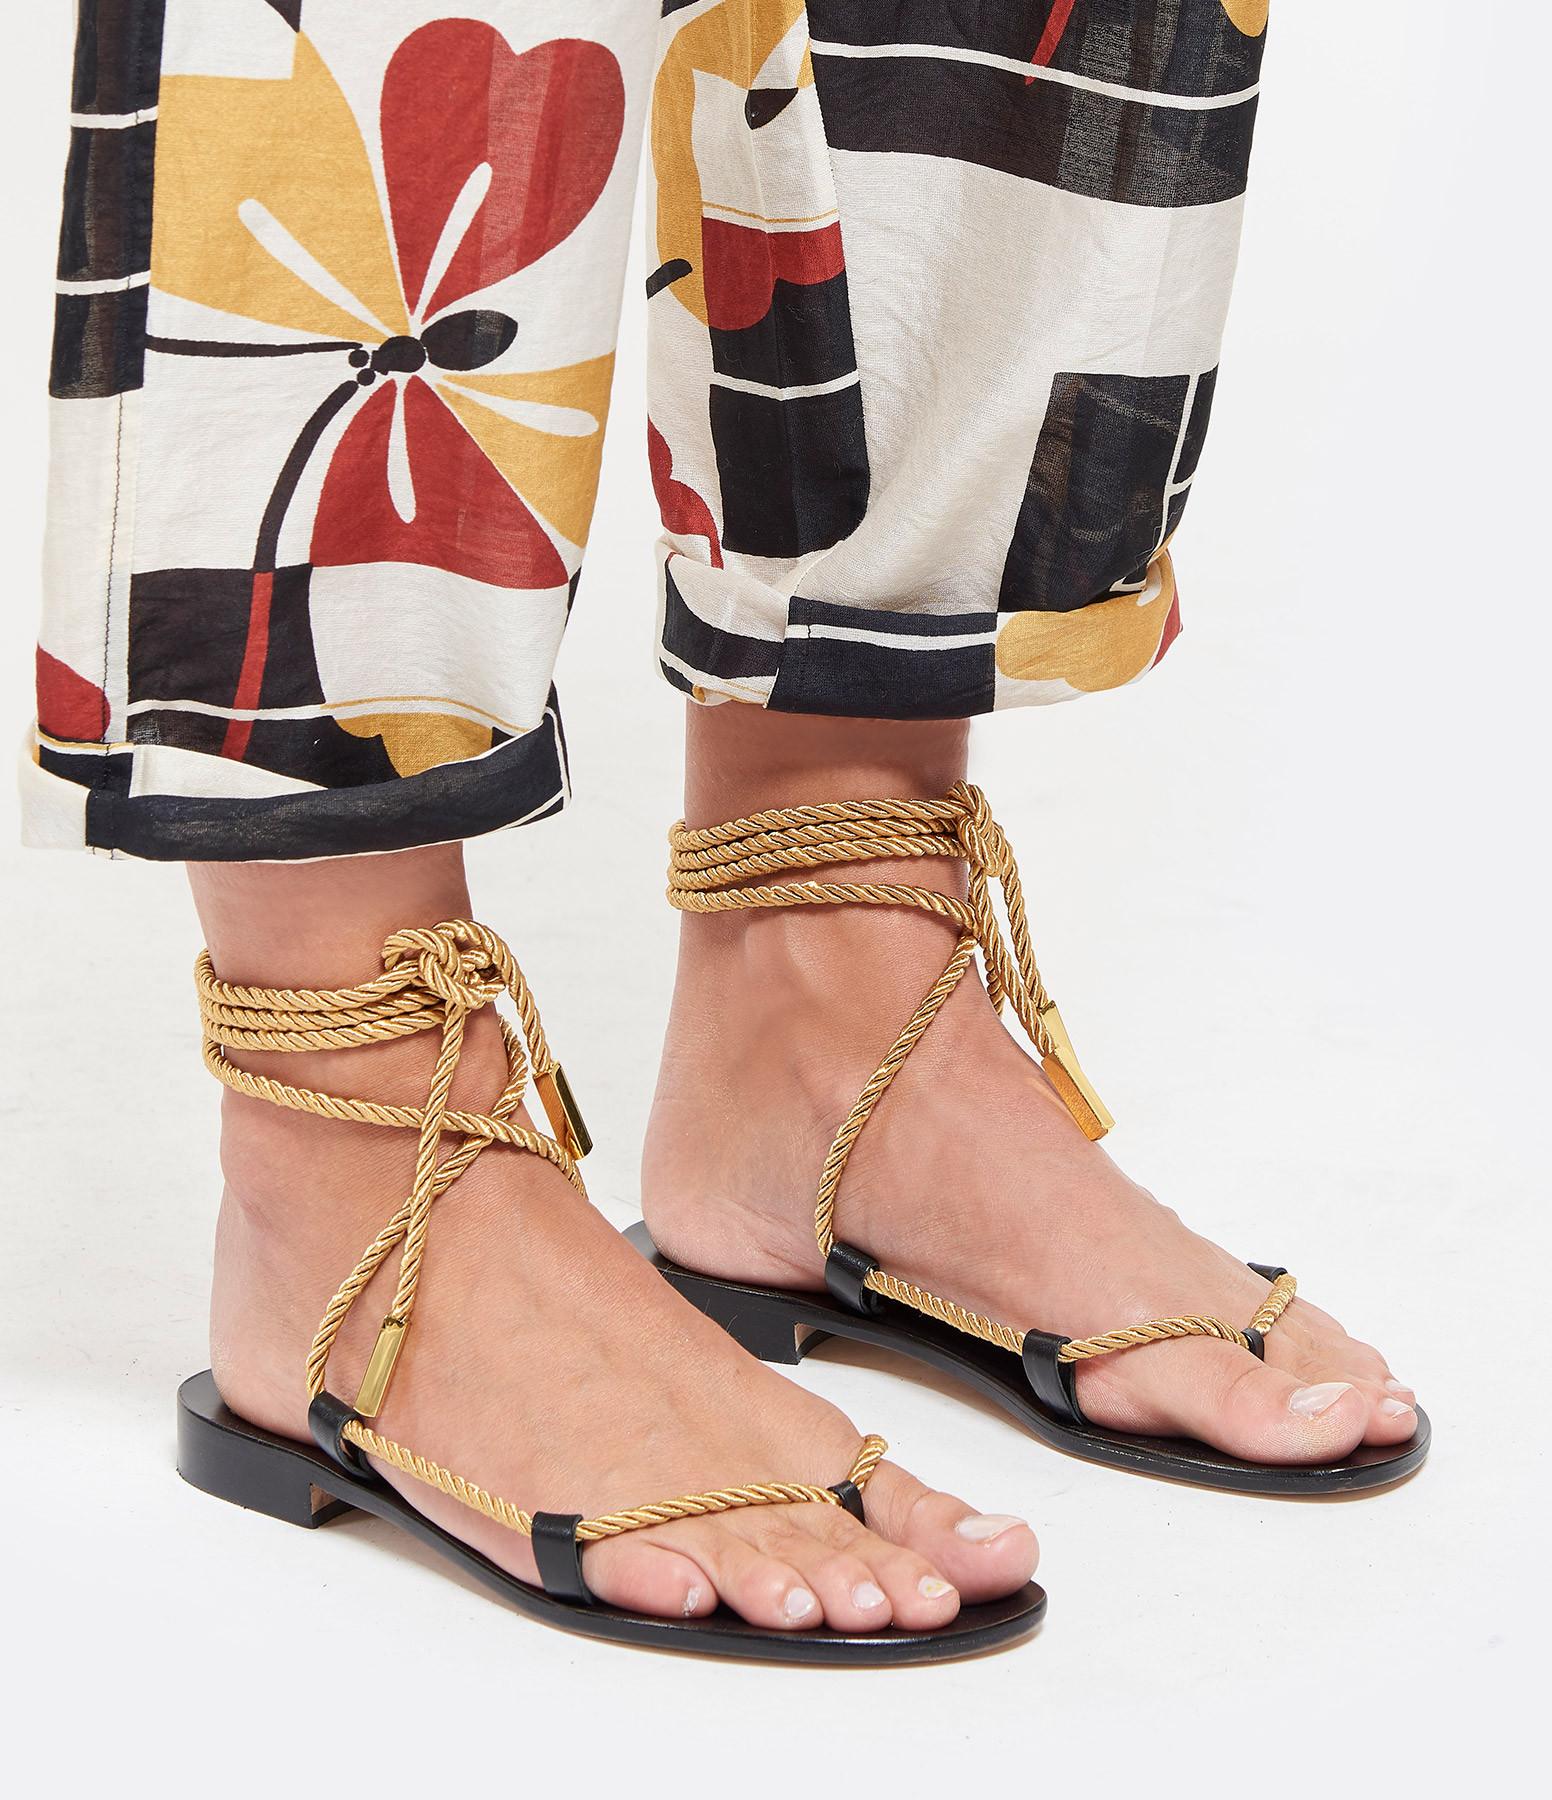 TARAH BLANCHE - Cordes Sandales Or Vielli